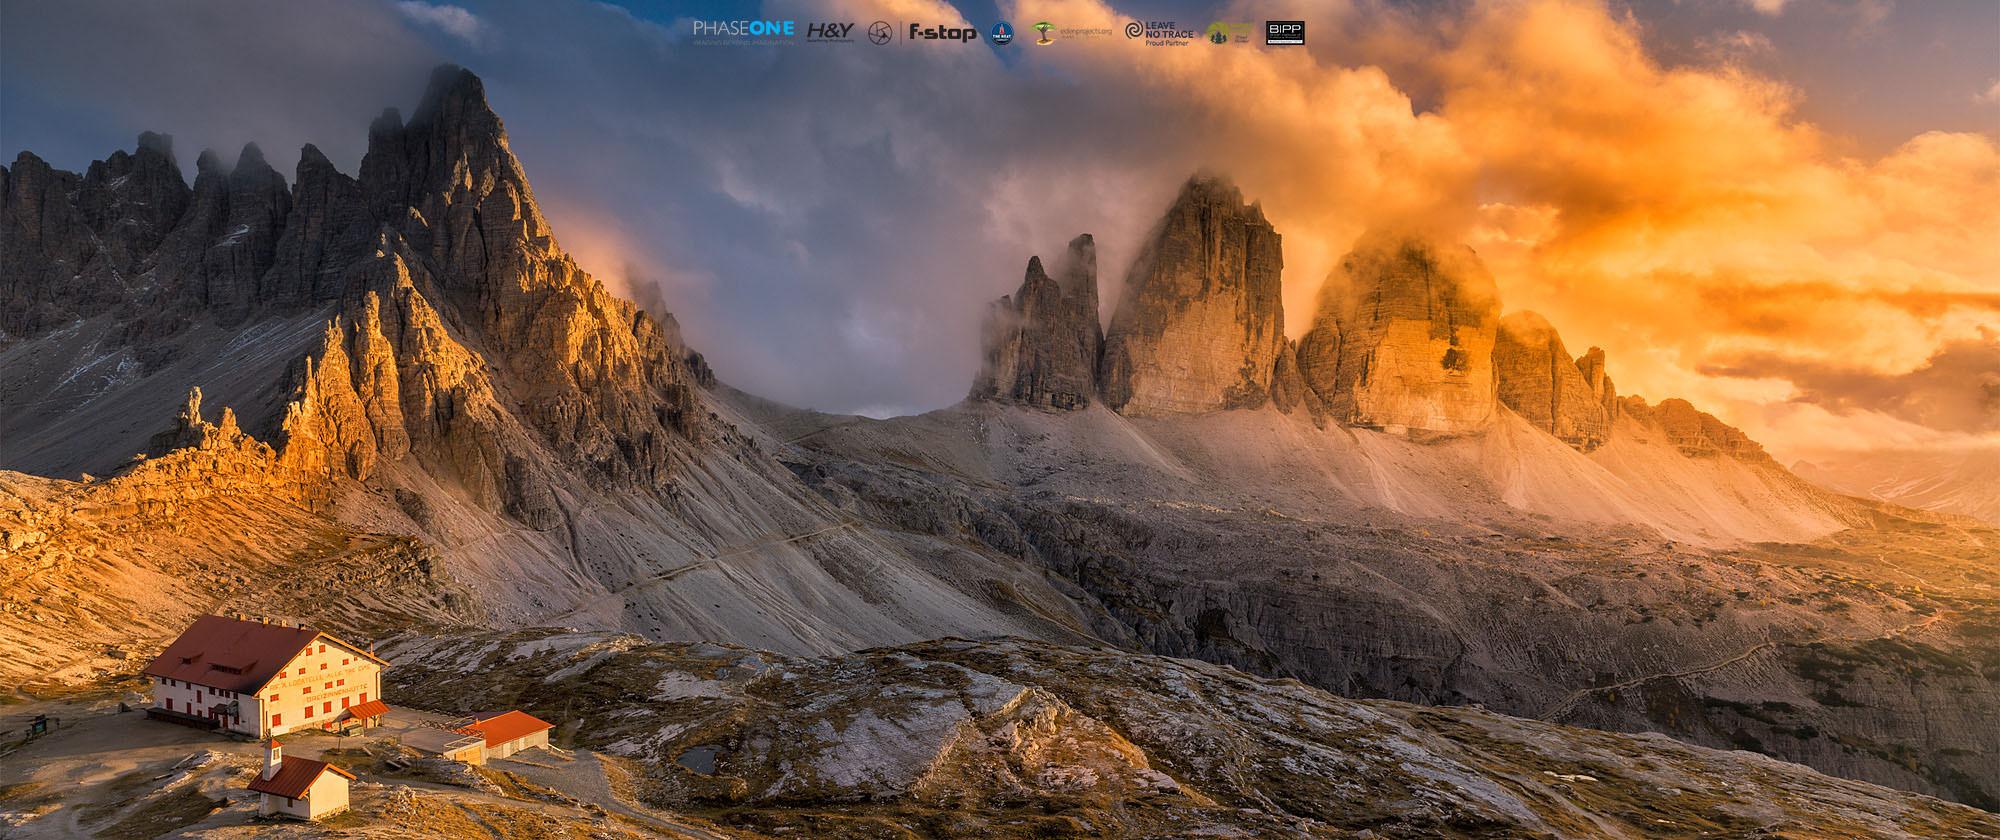 Tre Cime di Lavaredo, Dolomites (Italy, 2019)